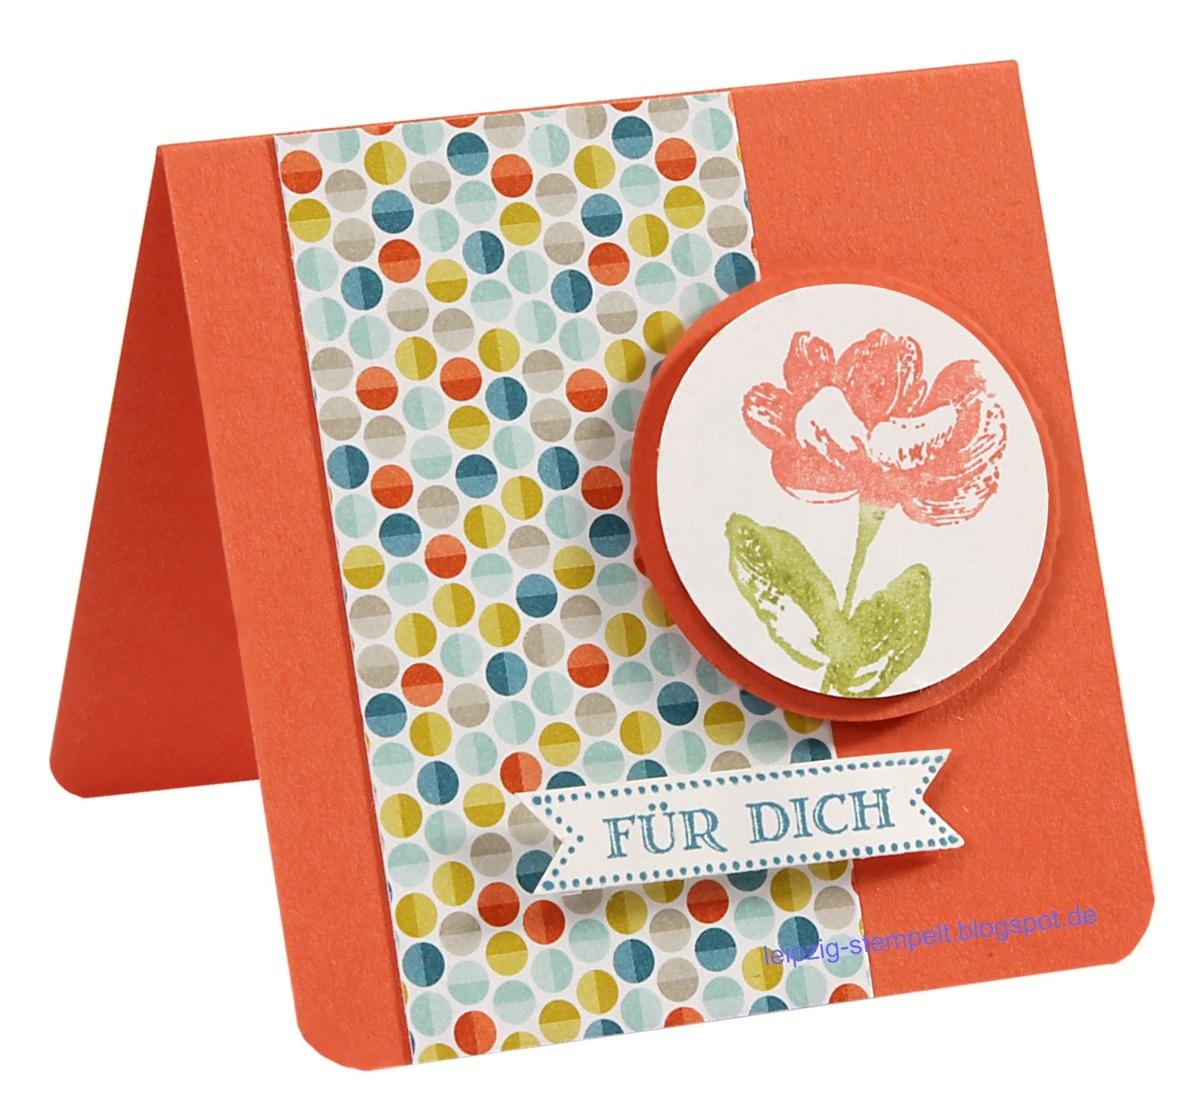 Famose Fähnchen, Karten, Oh hello, SAB, , Minicards